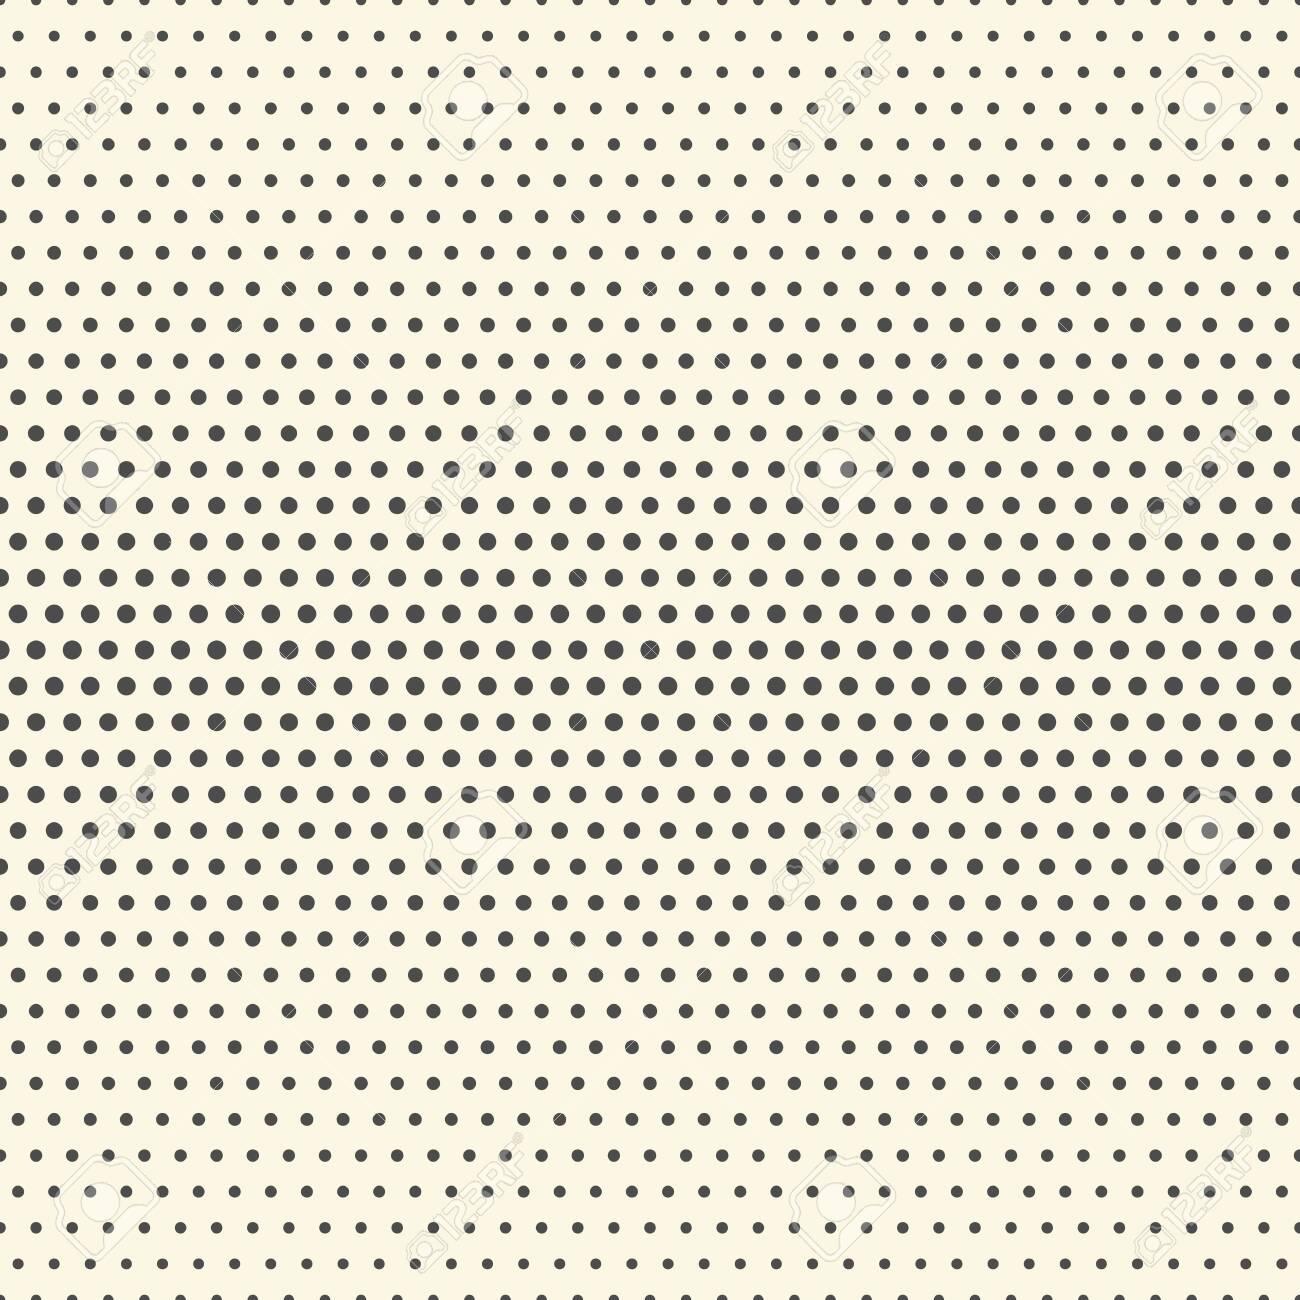 Seamless Halftone Pattern. Minimal Elegant Wallpaper. Vector Monochrome Texture - 141860405